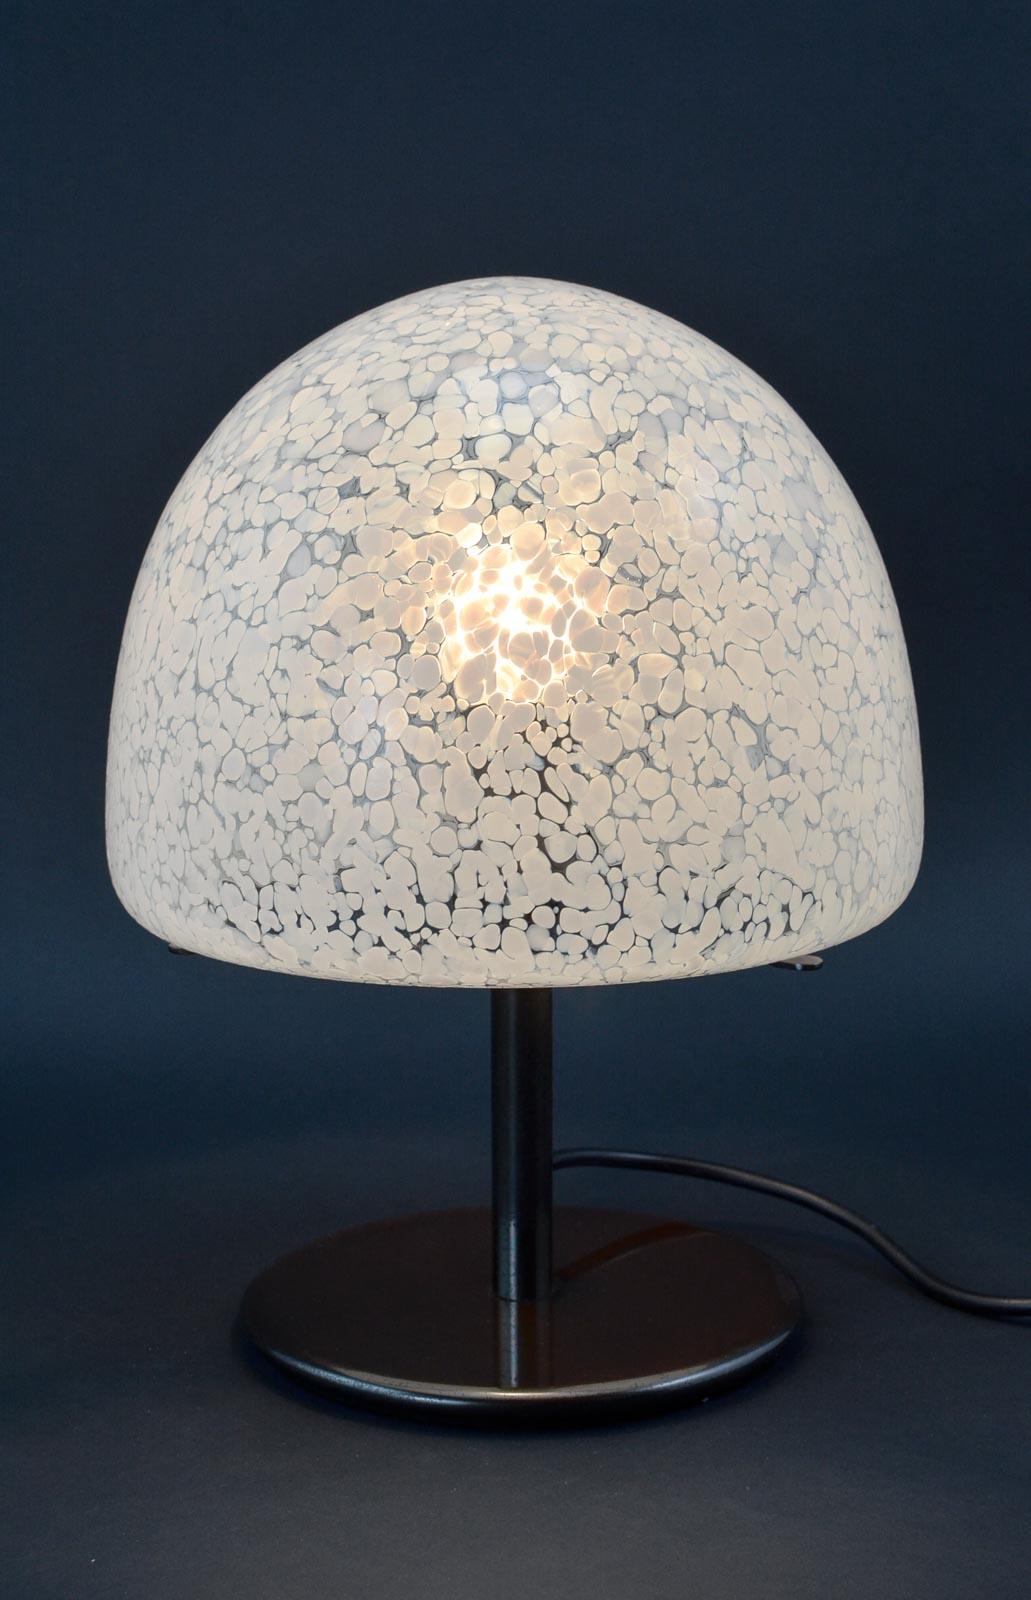 Mid Century Italian Murano Glass Table Lamp After Barovier E Toso, 1950s